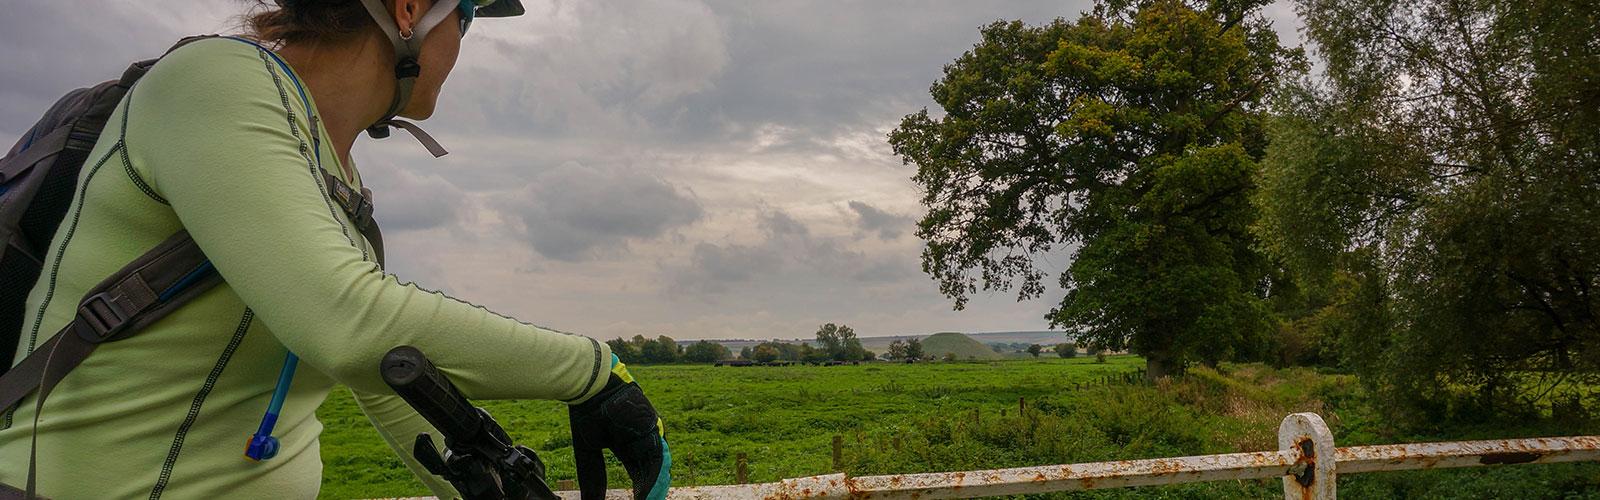 Archaeo-Safari: Avebury Uncovered